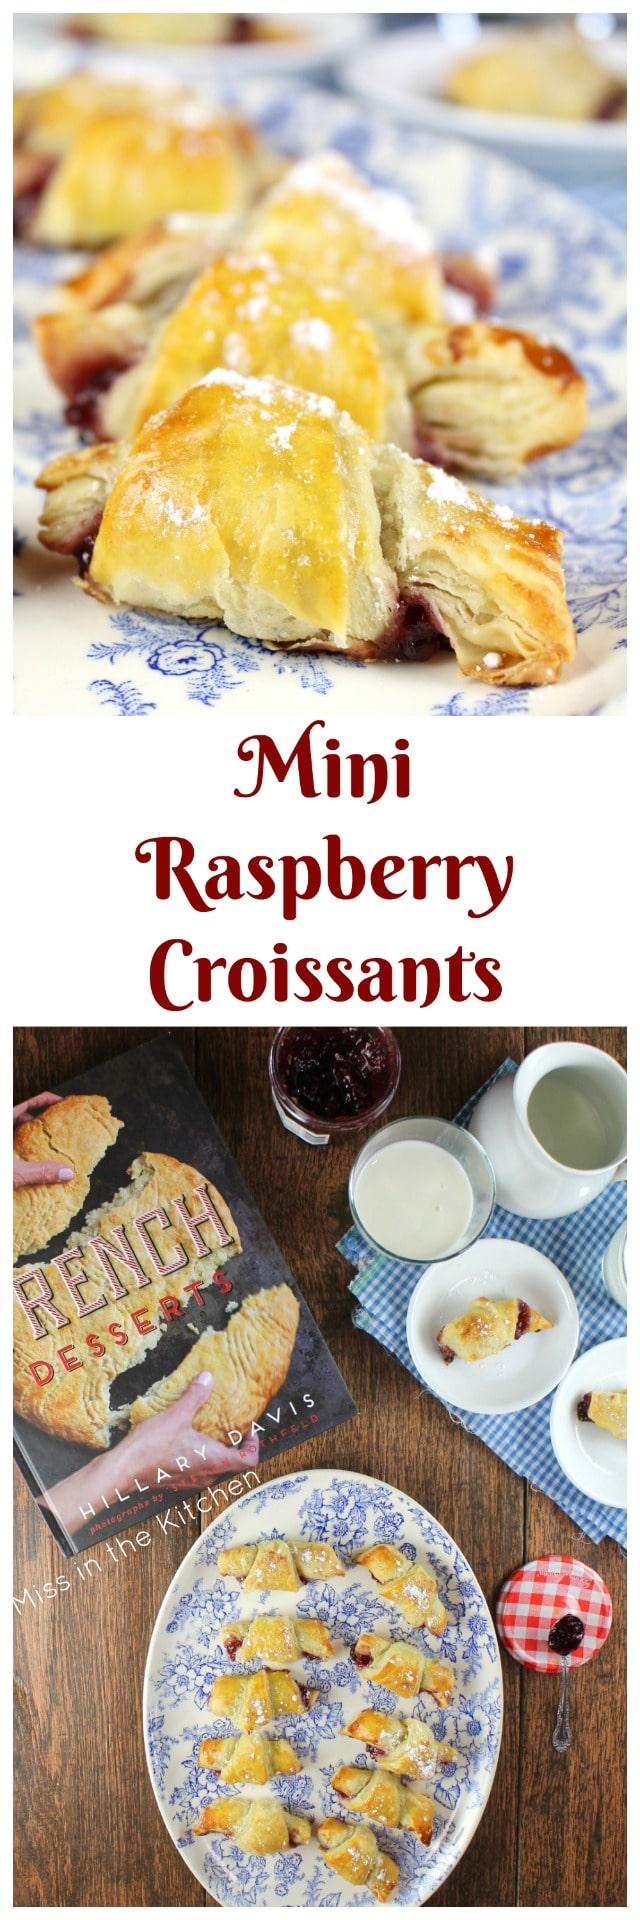 Mini Raspberry Croissants Recipe from French Desserts by Hillary Davis Perfect holiday dessert! Found at MissintheKitchen.com